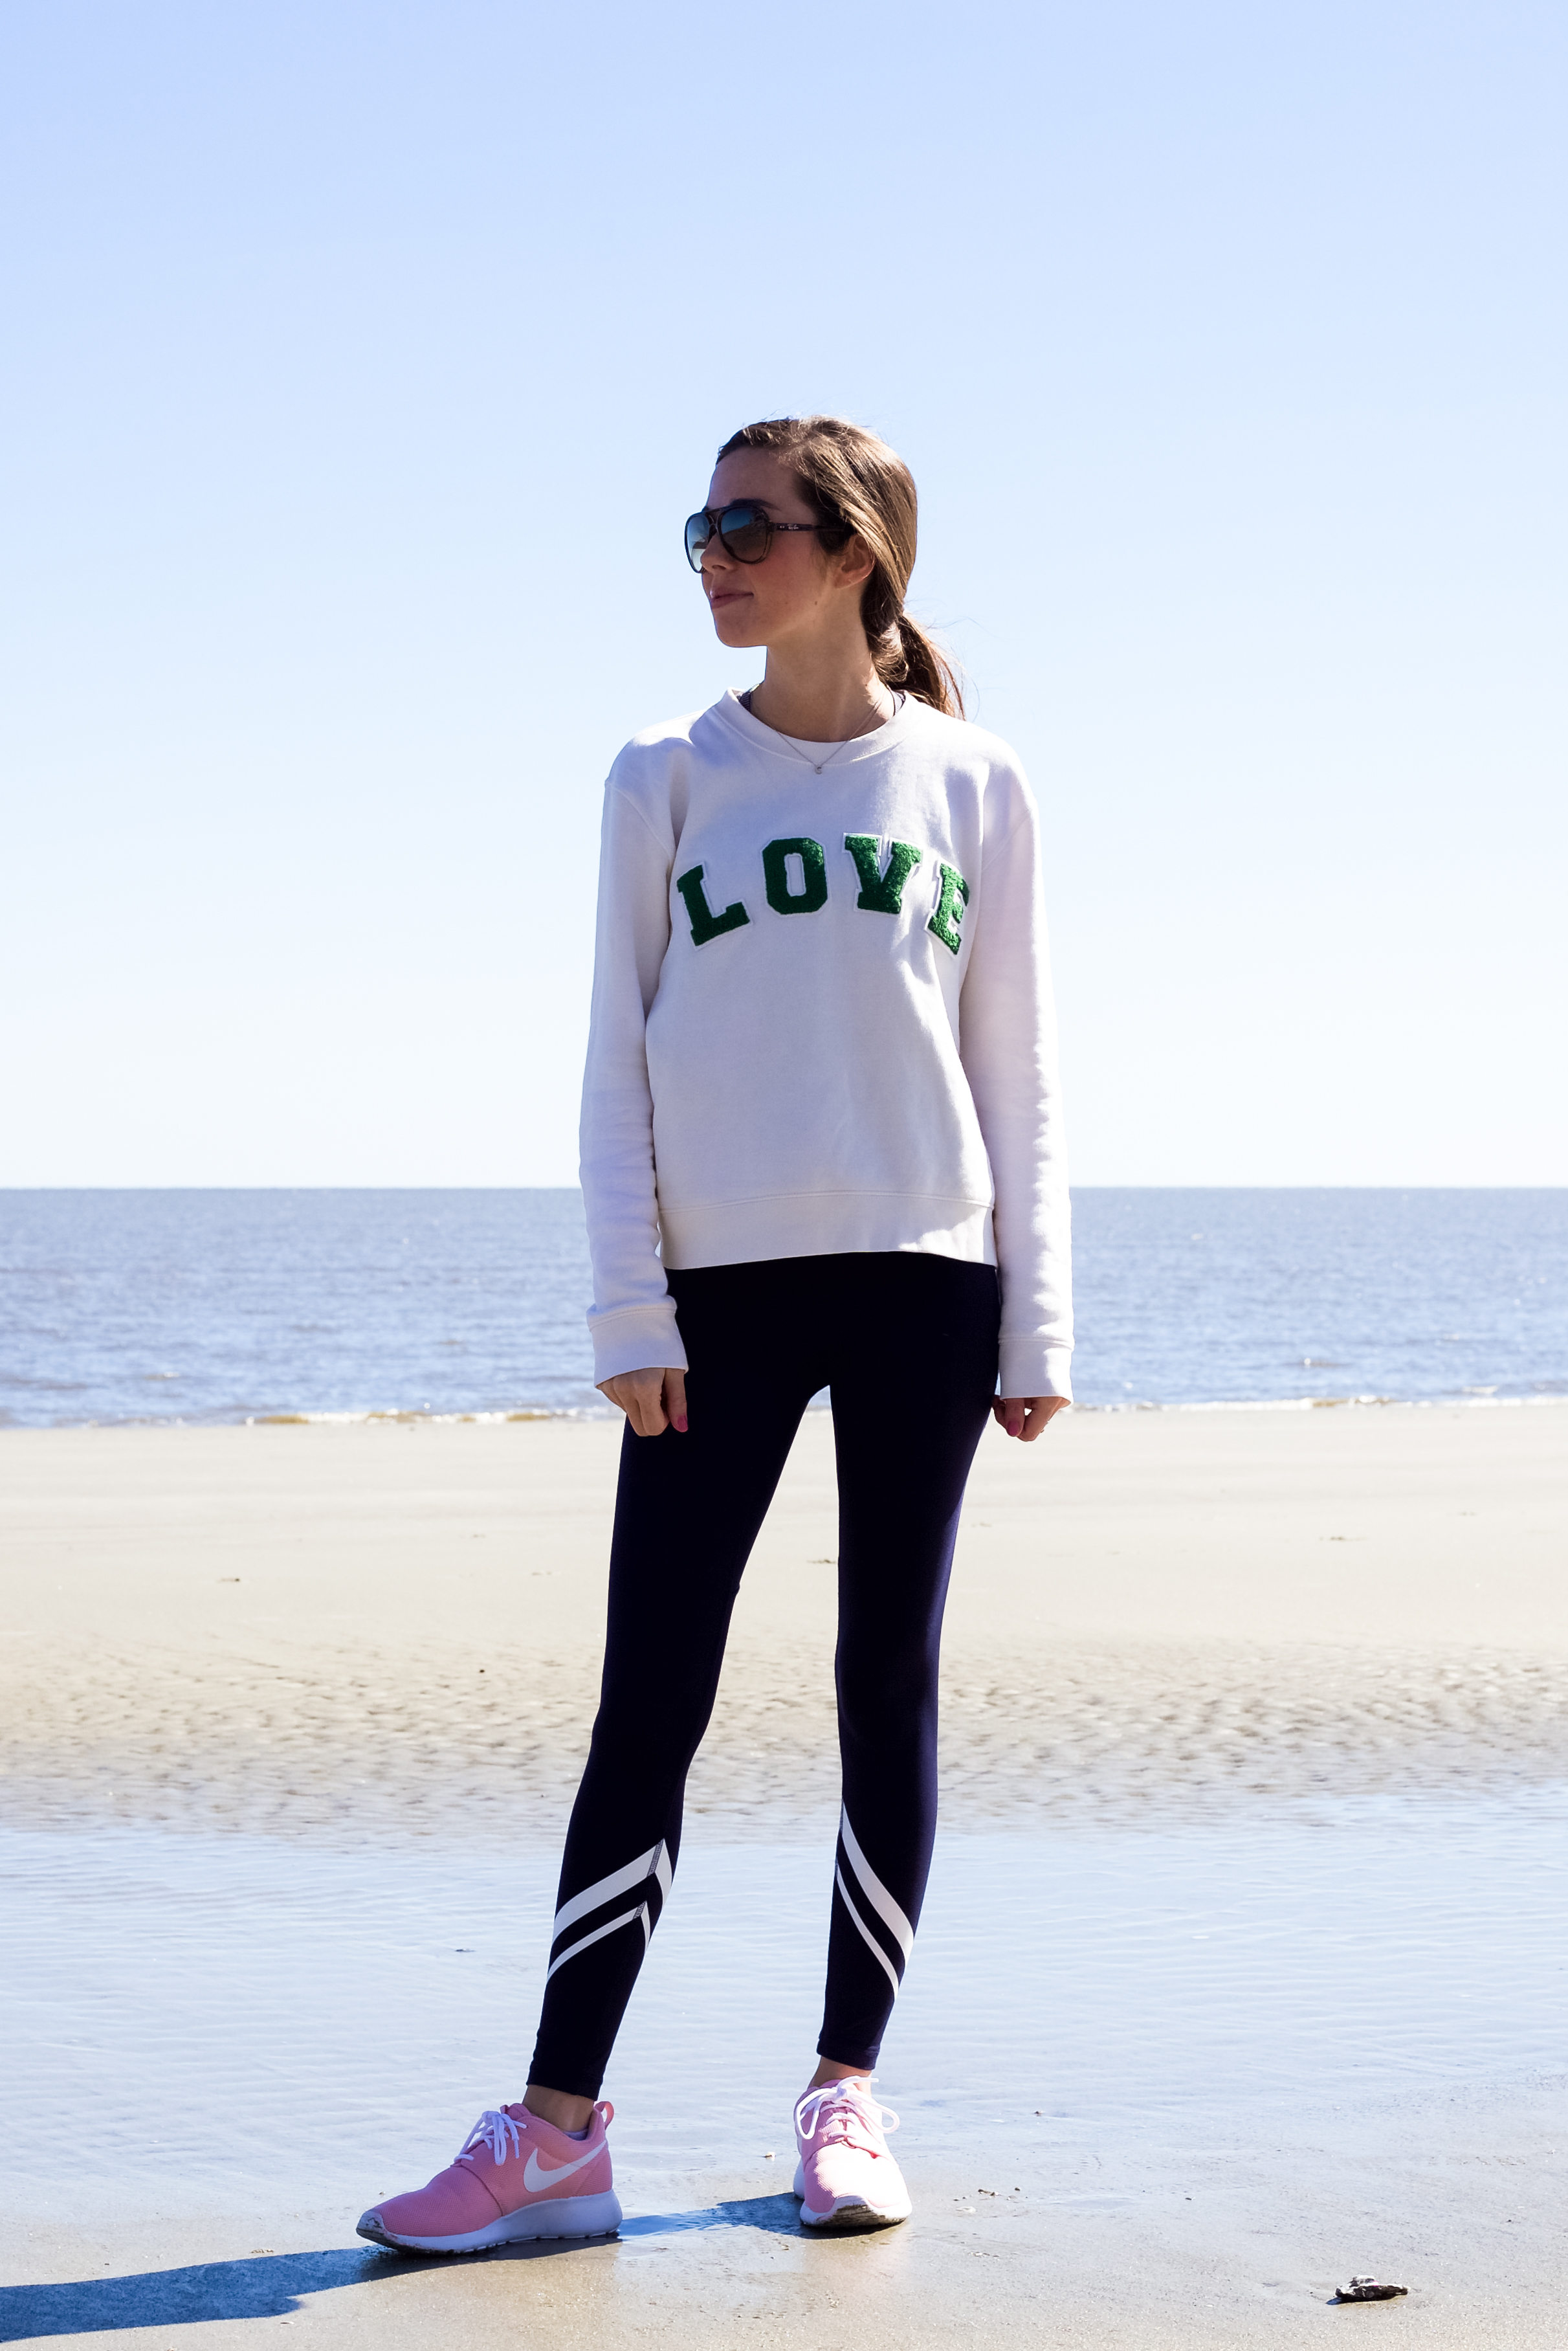 lcb style fashion blogger tory burch tory sport beach sea island nike (17 of 31).jpg